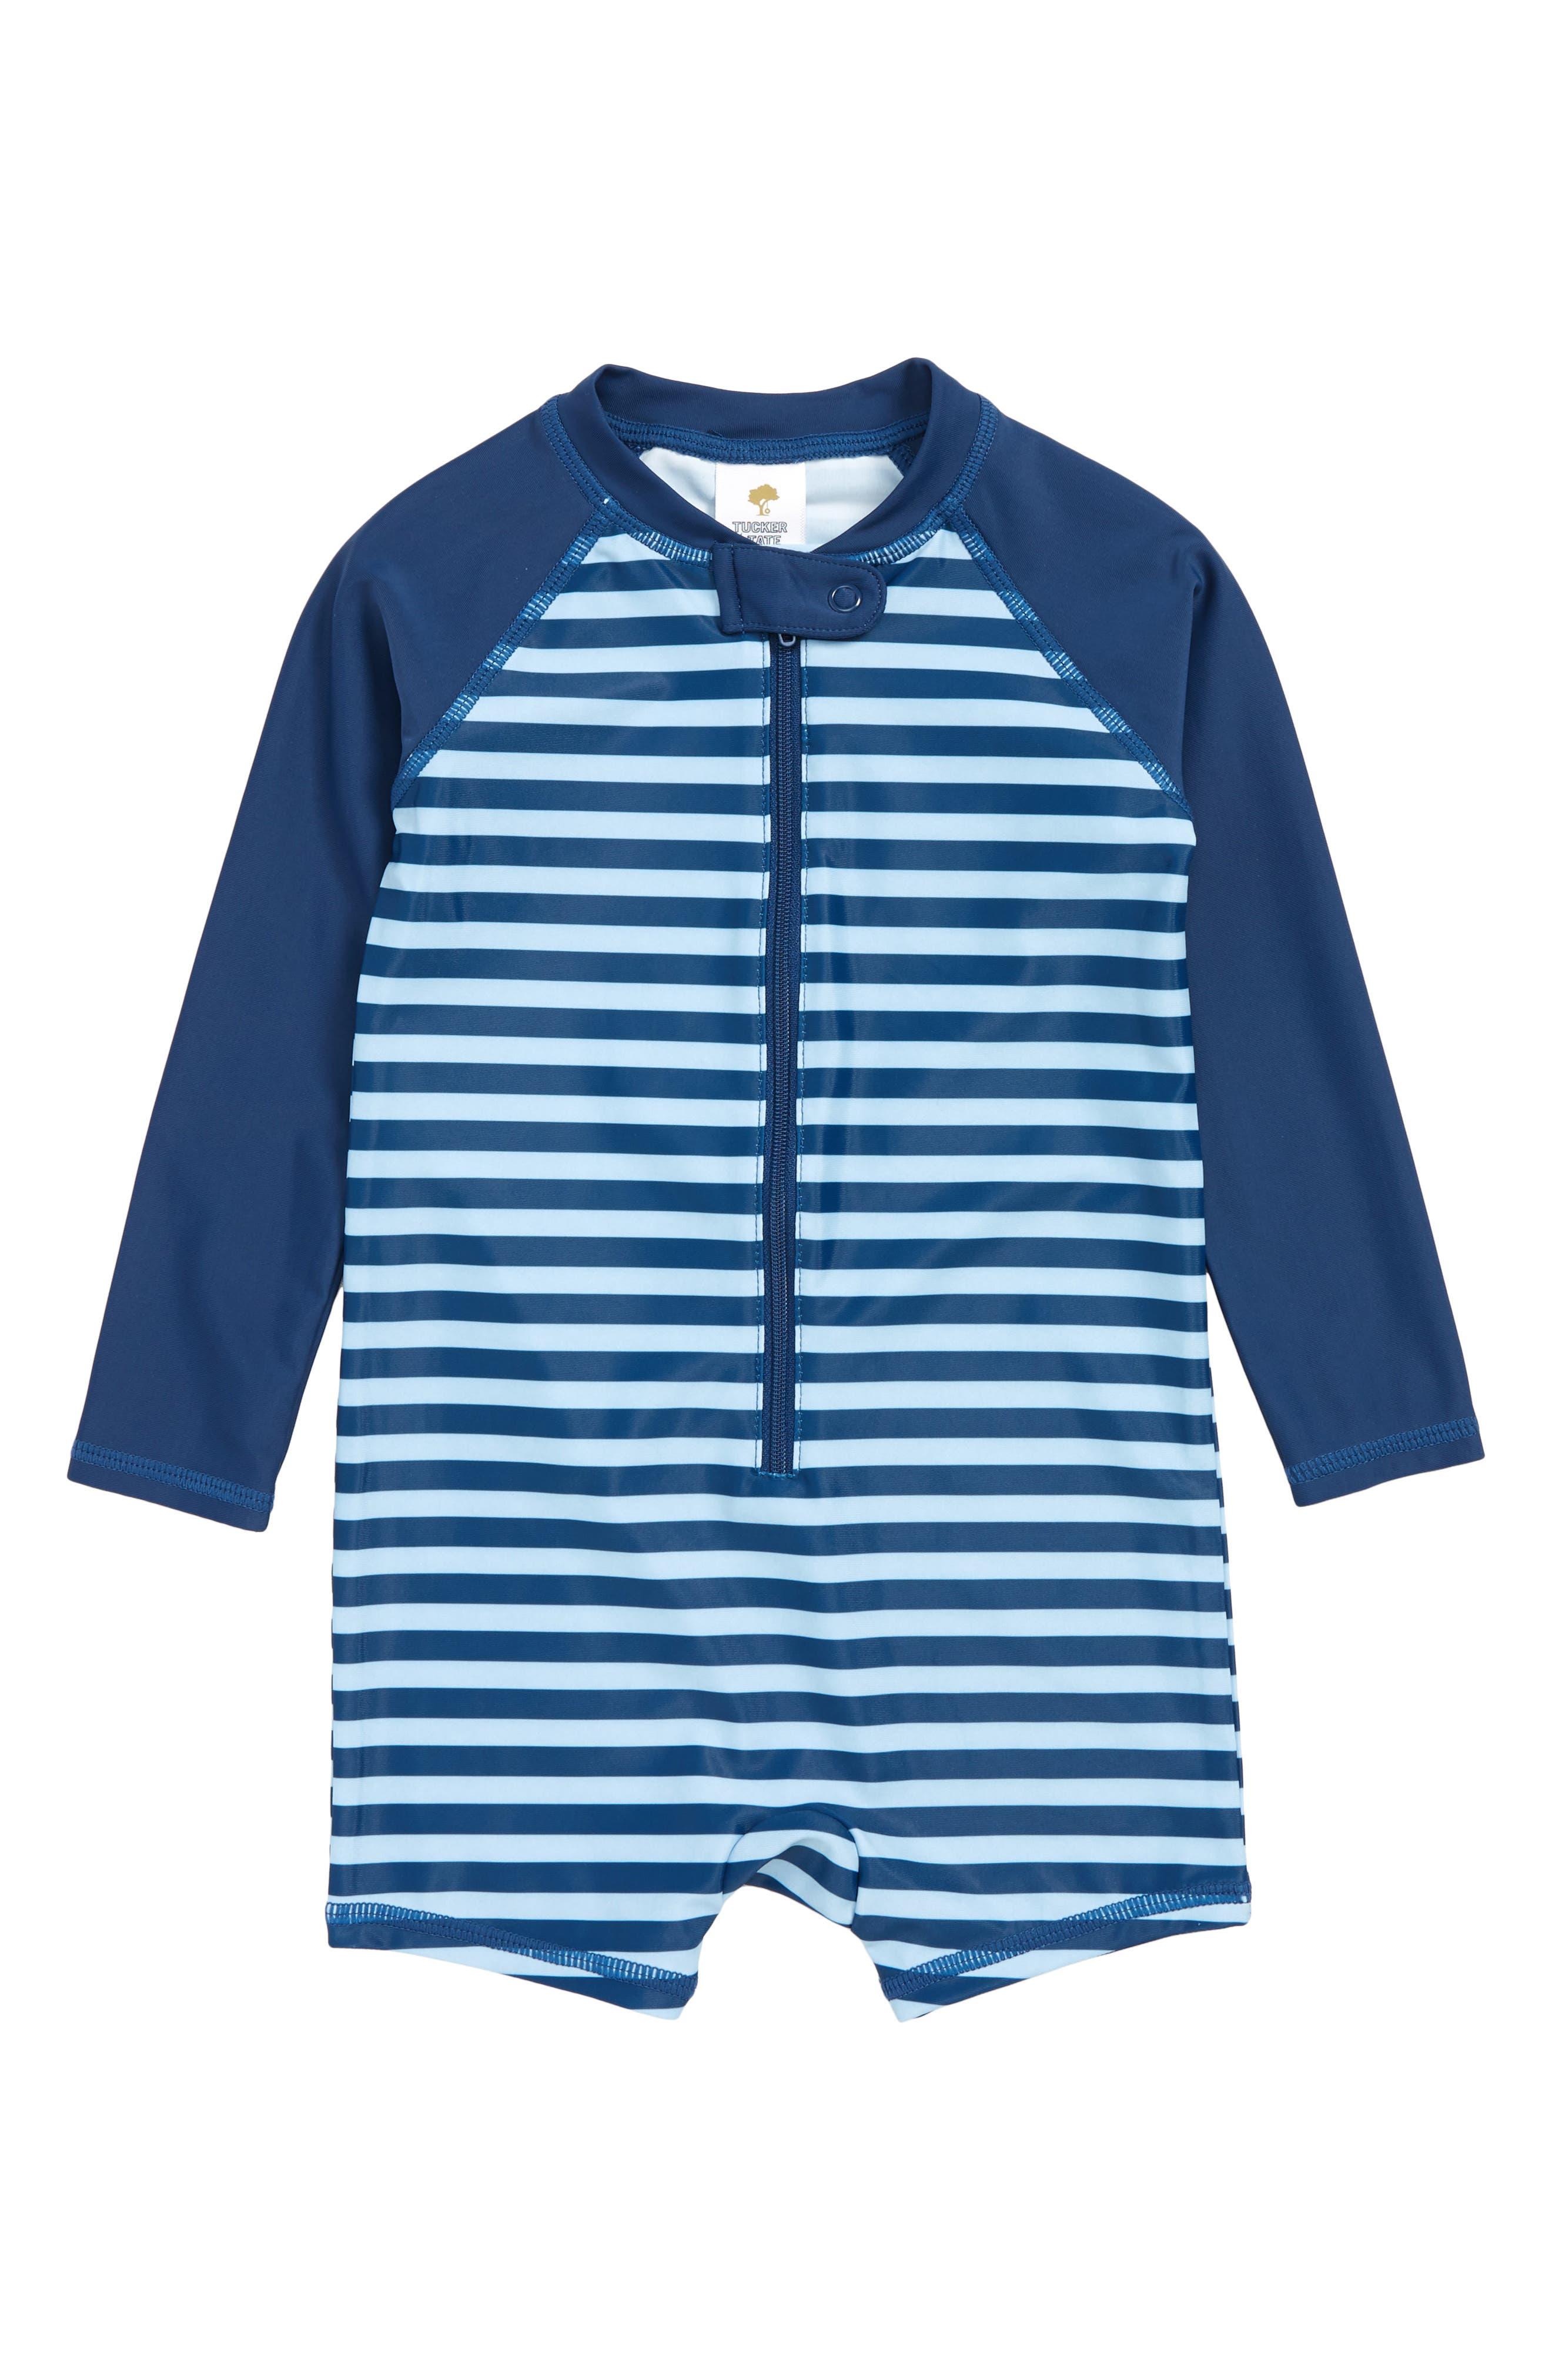 Fine Tucker Tate Girls Peach Fuzzy Kangaroo Pocket Sweatshirt Size 3 Clothing, Shoes & Accessories Baby & Toddler Clothing